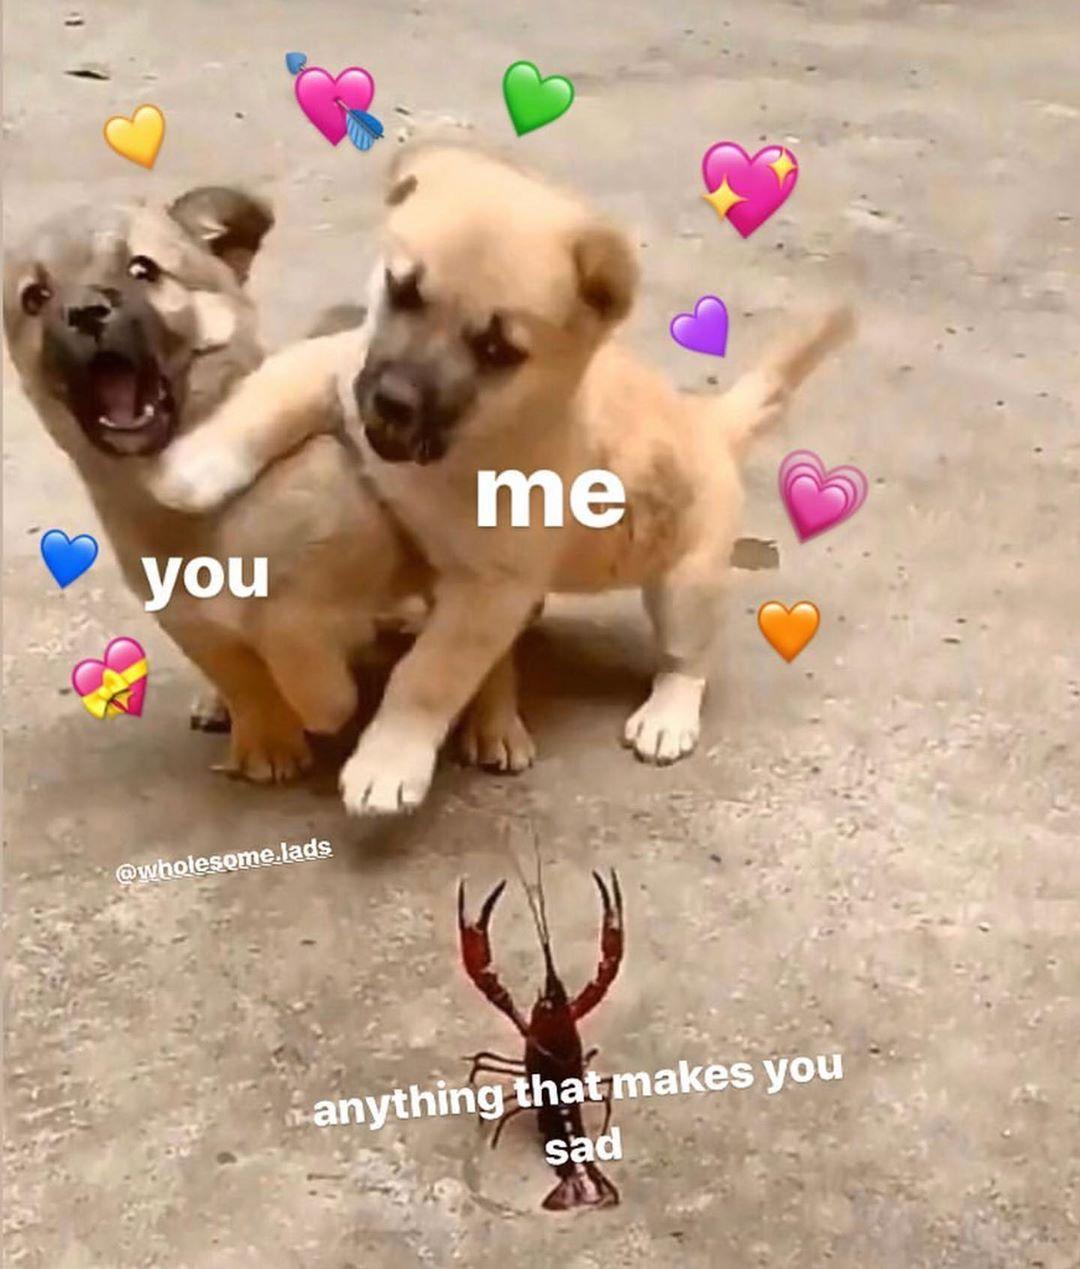 12 5 Ezer Kedveles 79 Hozzaszolas Uwu University Wholesomewhore Instagram Hozzaszolasa Dog Memes Animal Memes Funny Animal Videos